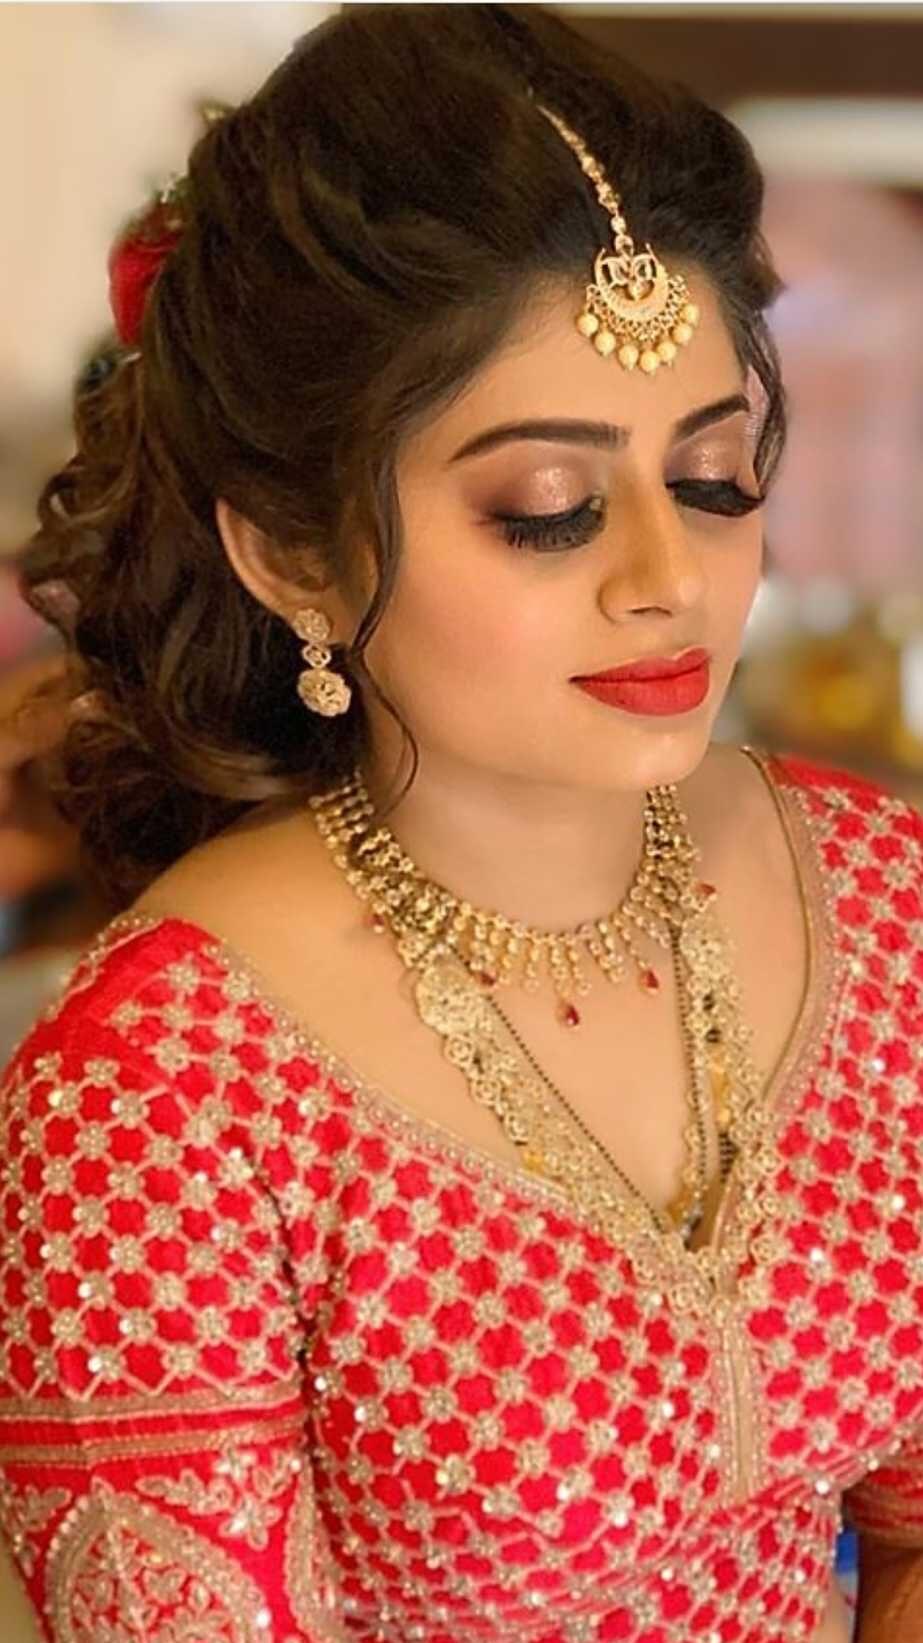 Make up artist in Bhopal